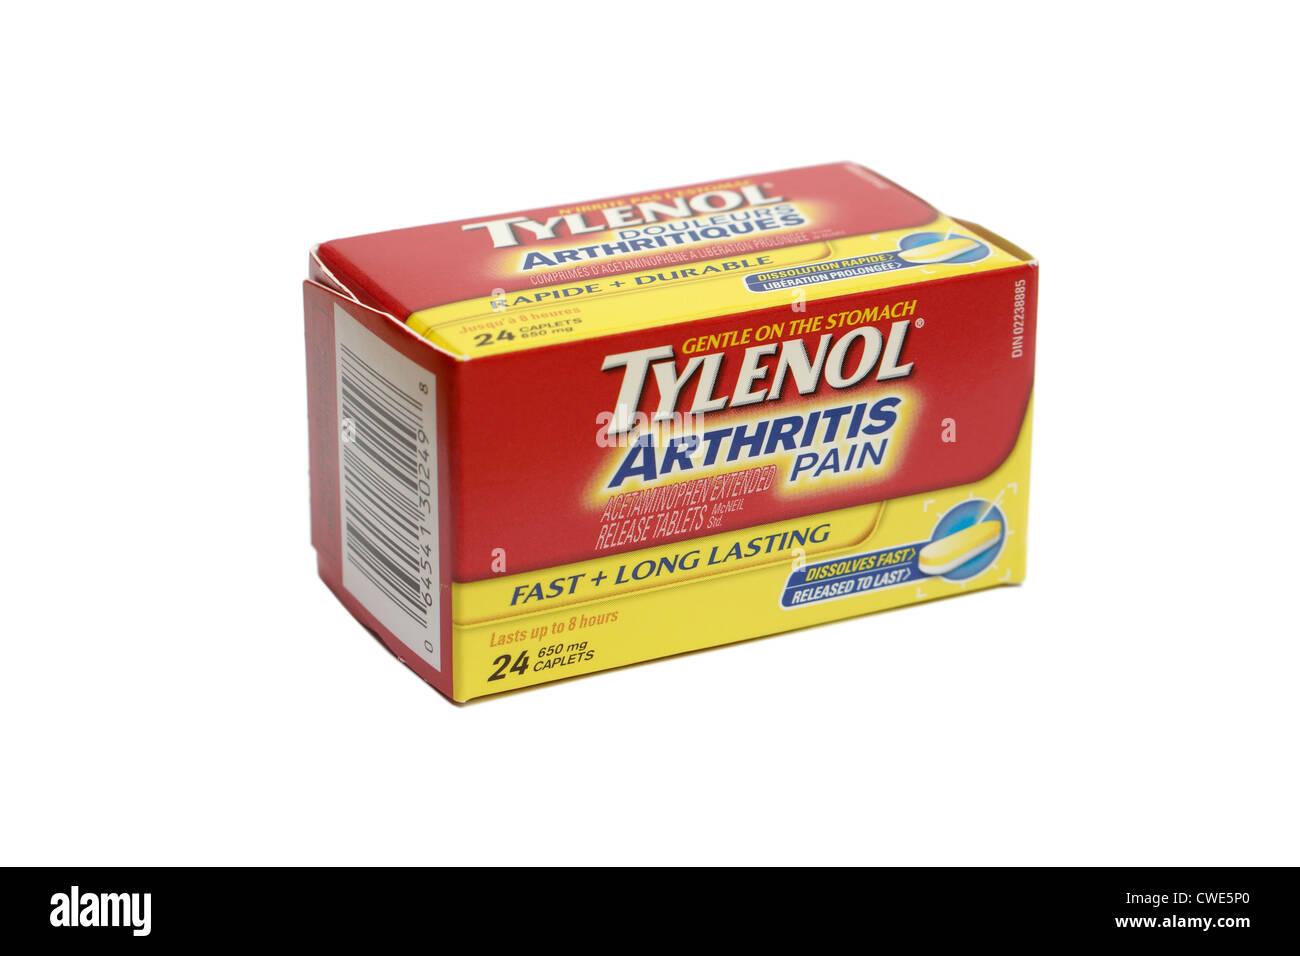 Tylenol Arthritis - Stock Image